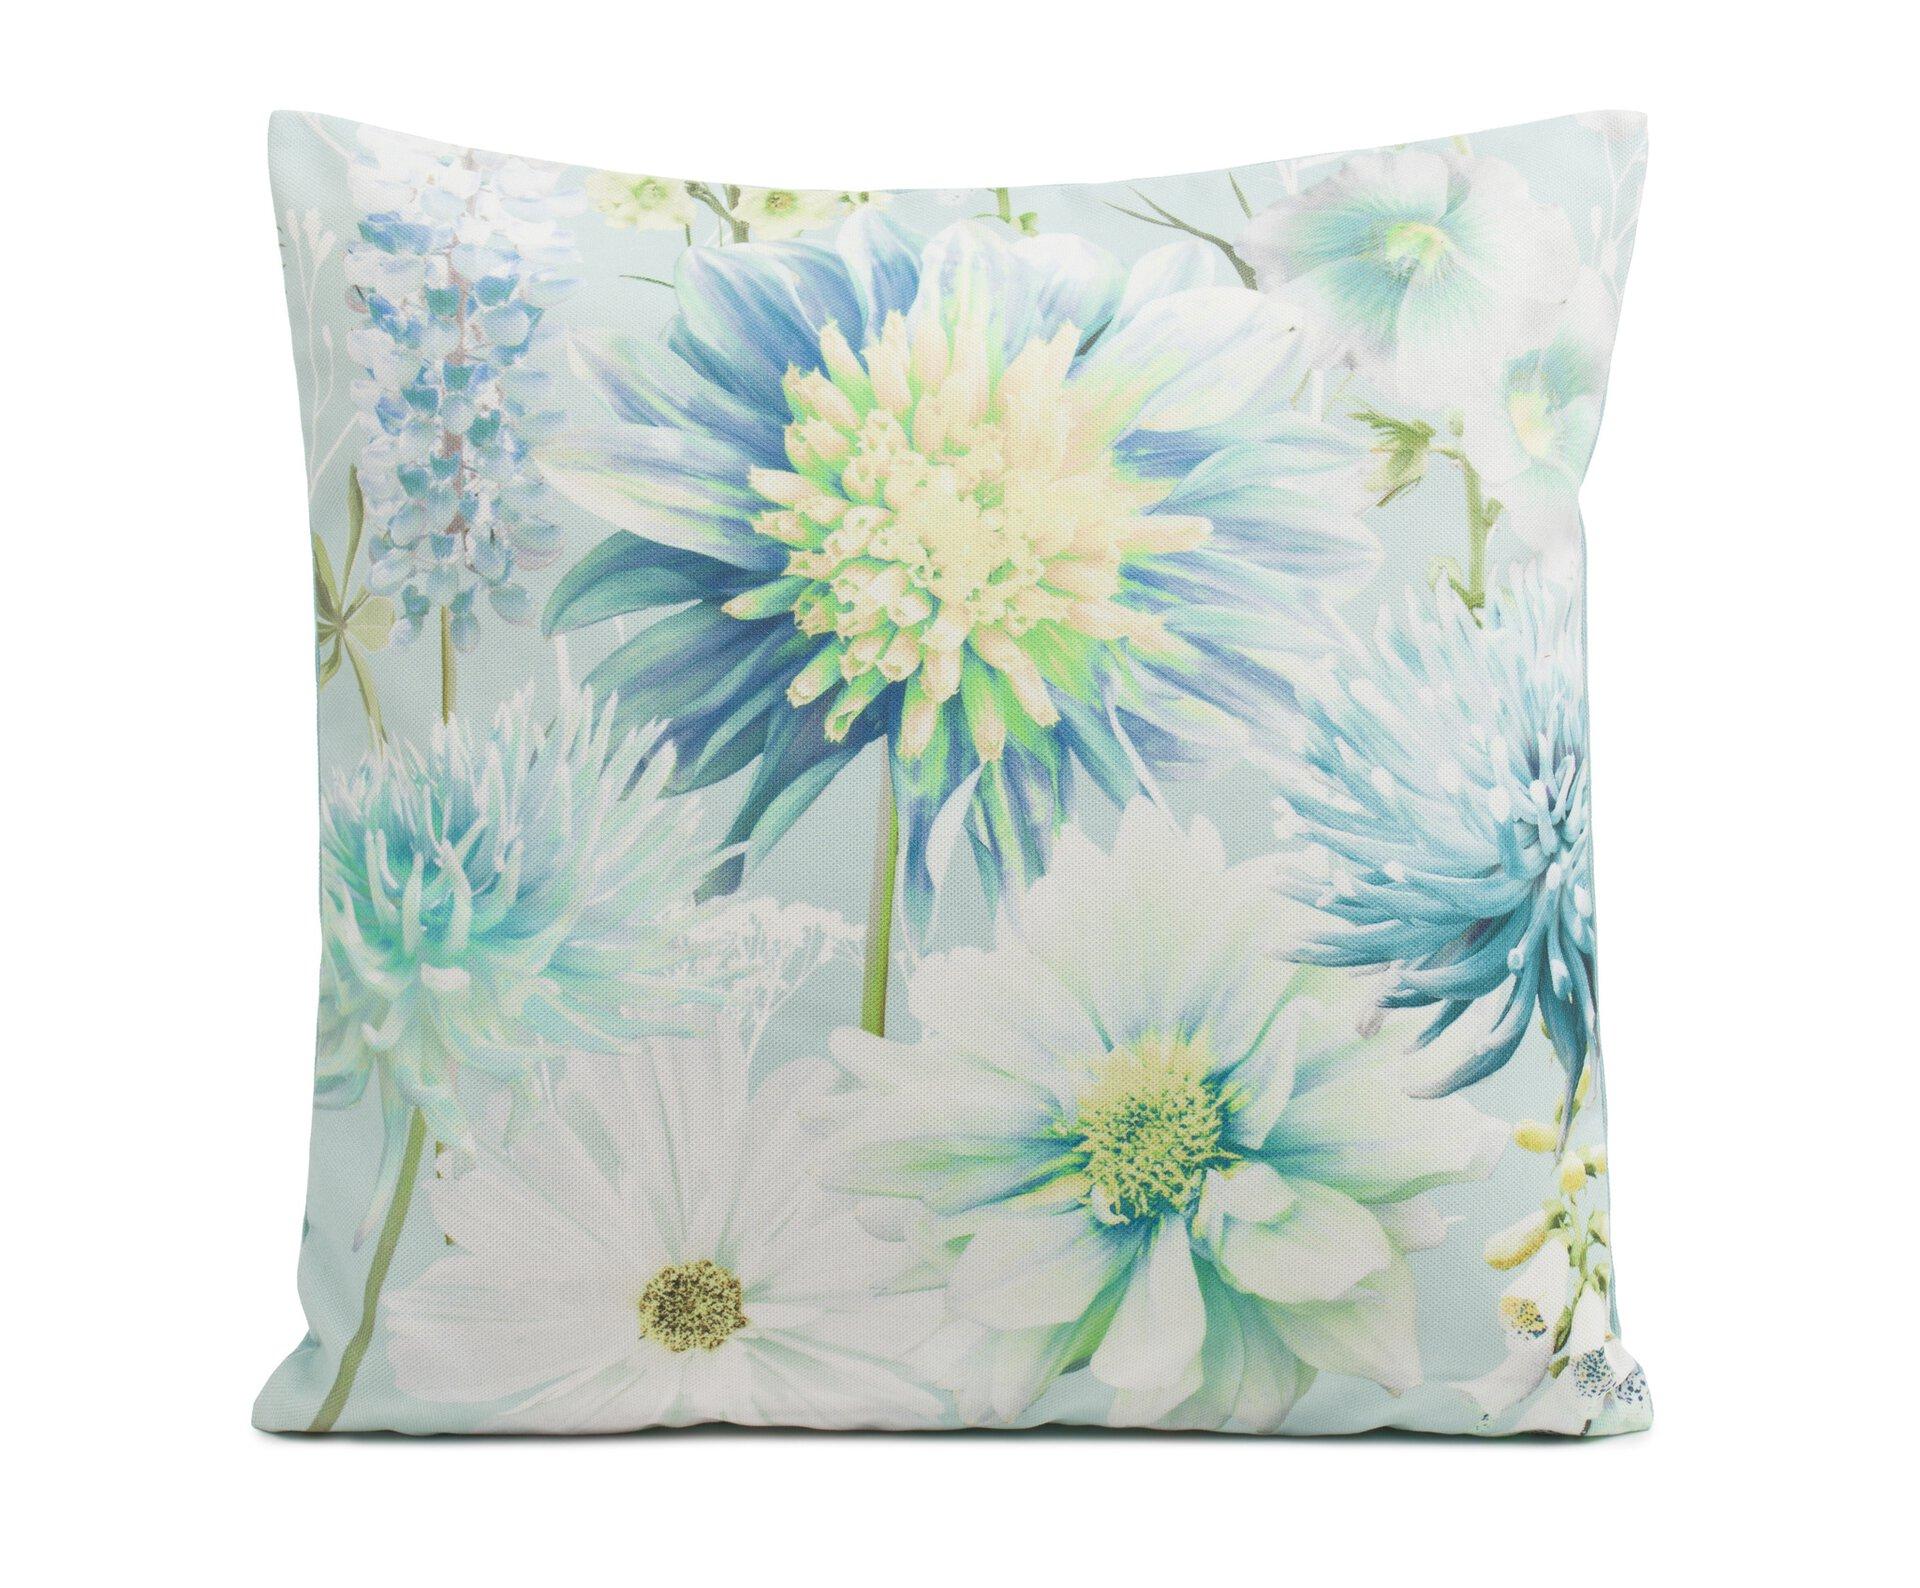 Kissenhülle Contessa Ambiente Trendlife Textil Blau 50 x 50 cm